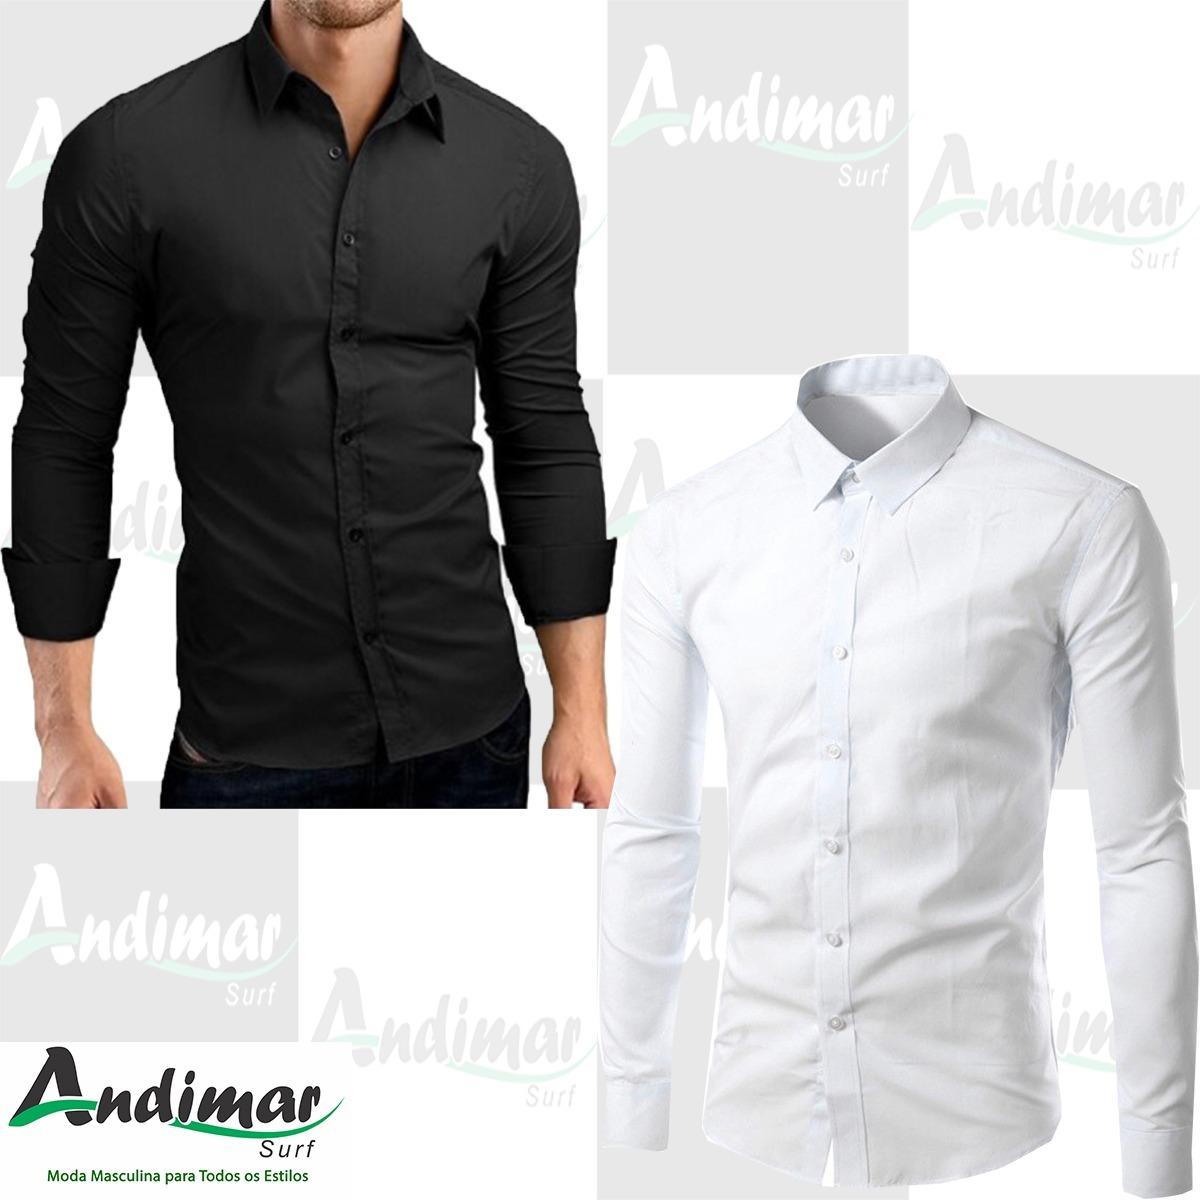 e4b57e9adf kit 2 camisa social masculina slim fit preta branca luxo top. Carregando  zoom.